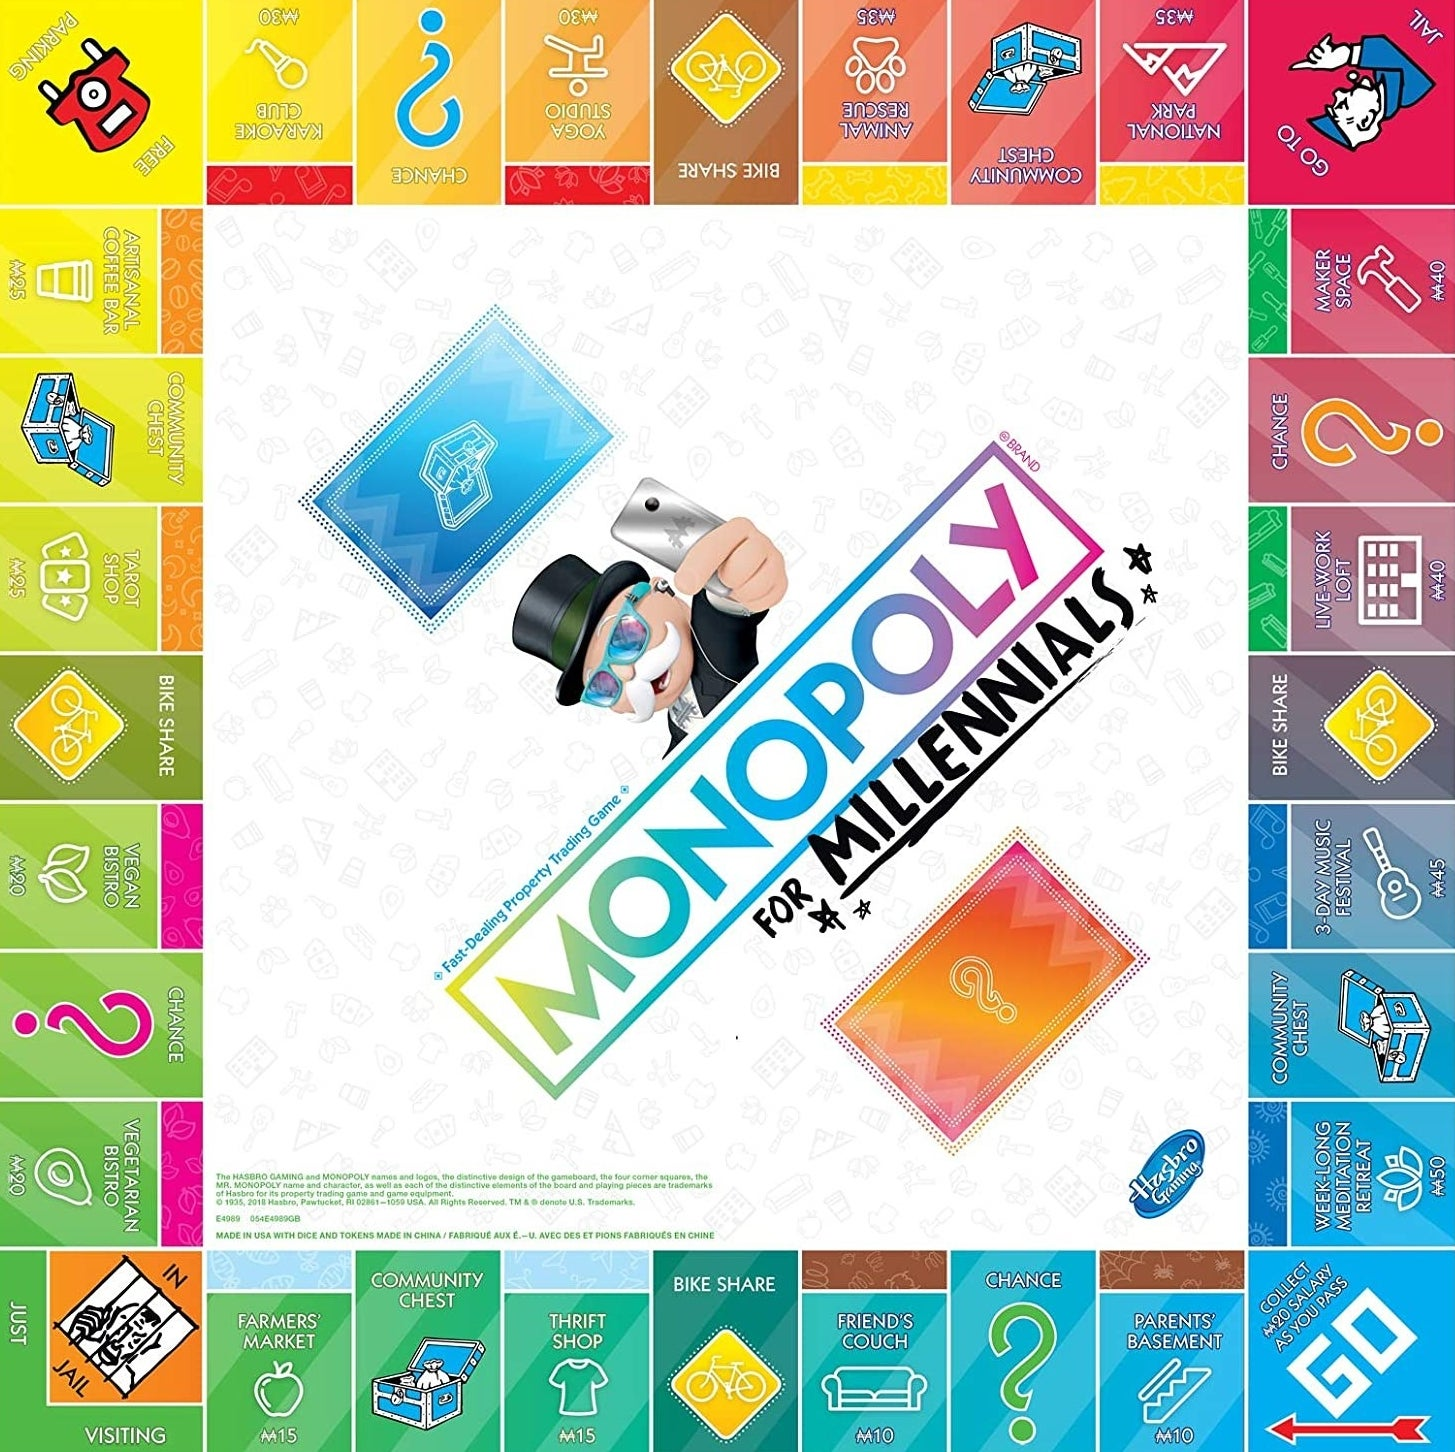 The Millenial Monopoly board